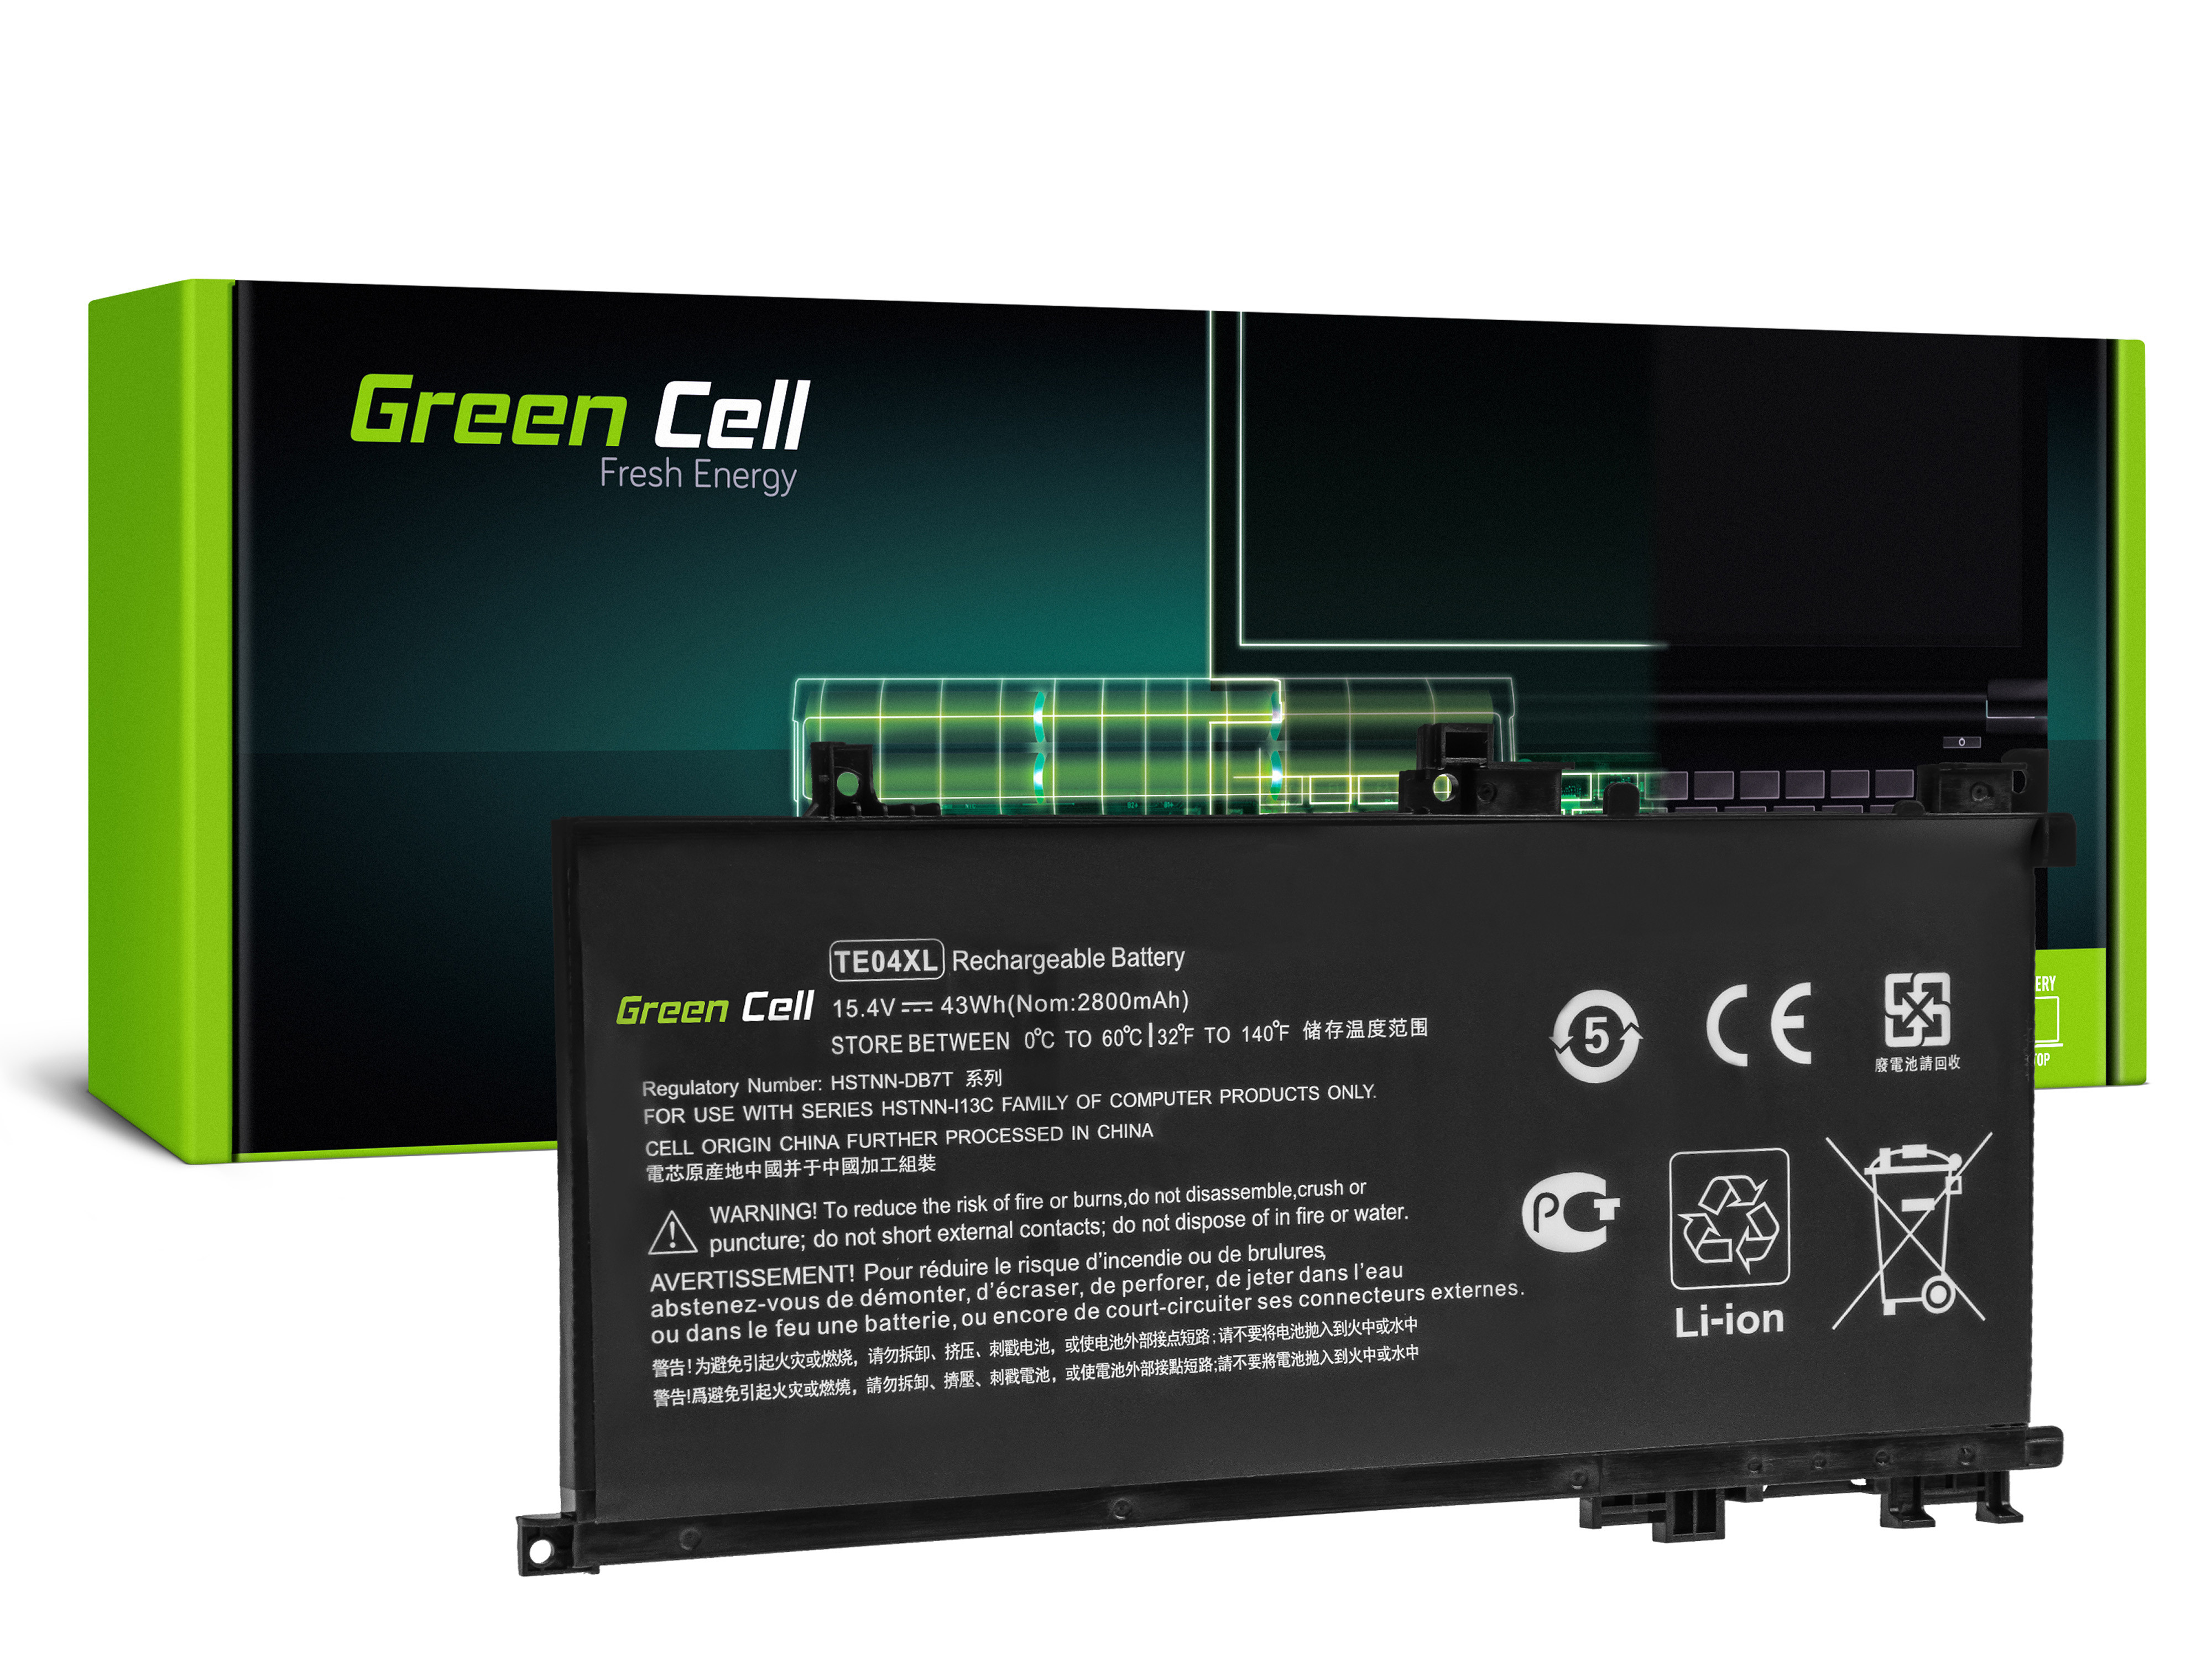 Green Cell HP180 Baterie HP TE04XL, HP Omen 15-AX202NW 15-AX205NW 15-AX212NW 15-AX213NW, HP Pavilion 15-BC501NW 15-BC505NW 15-BC507NW 2800mAh Li-Pol - neoriginální